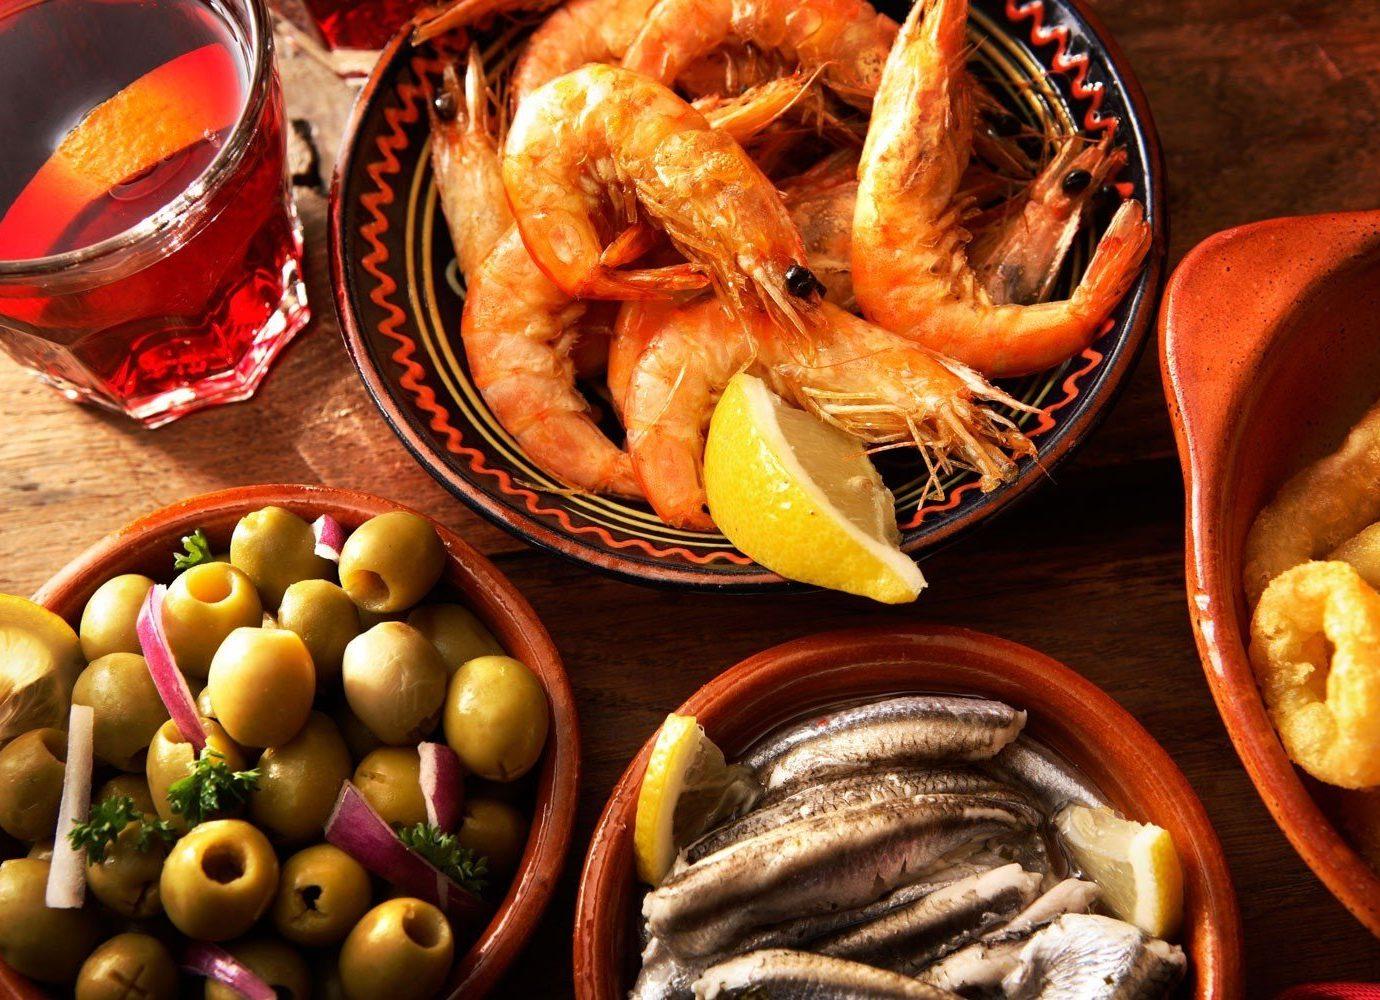 Trip Ideas food table plate dish produce cuisine Seafood seafood boil meal asian food vegetable